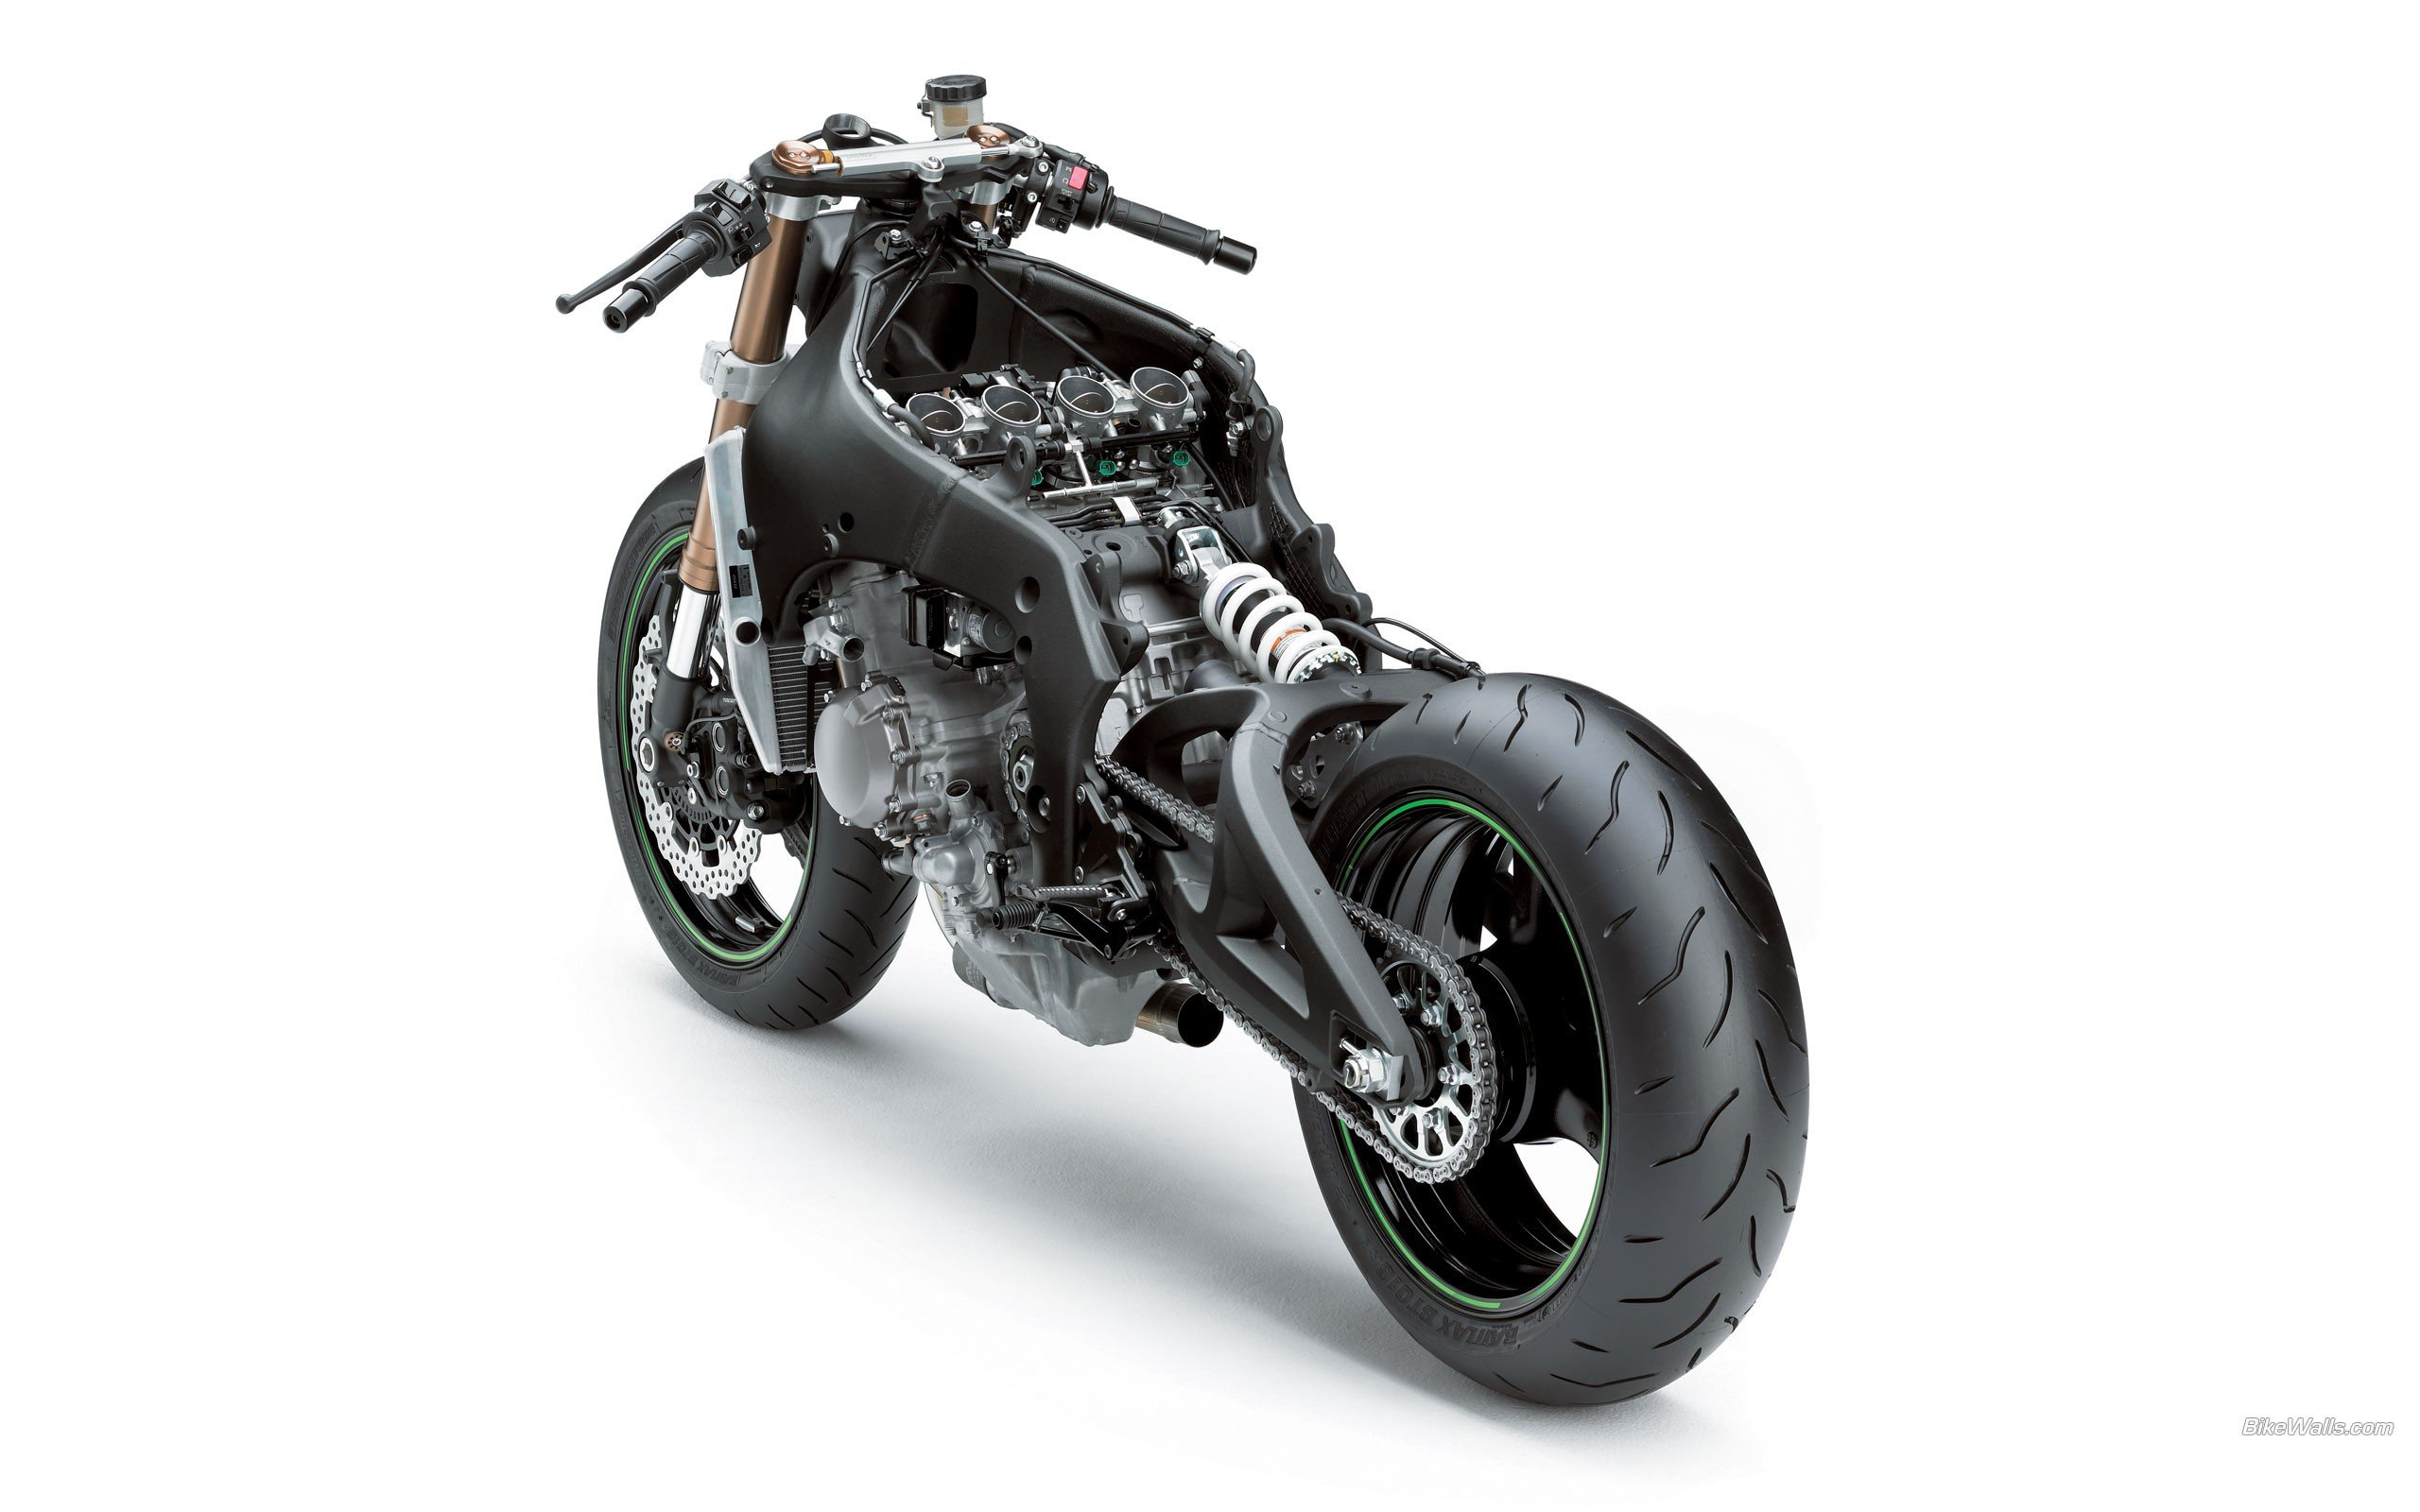 Обои motorcycle. Мотоциклы foto 14